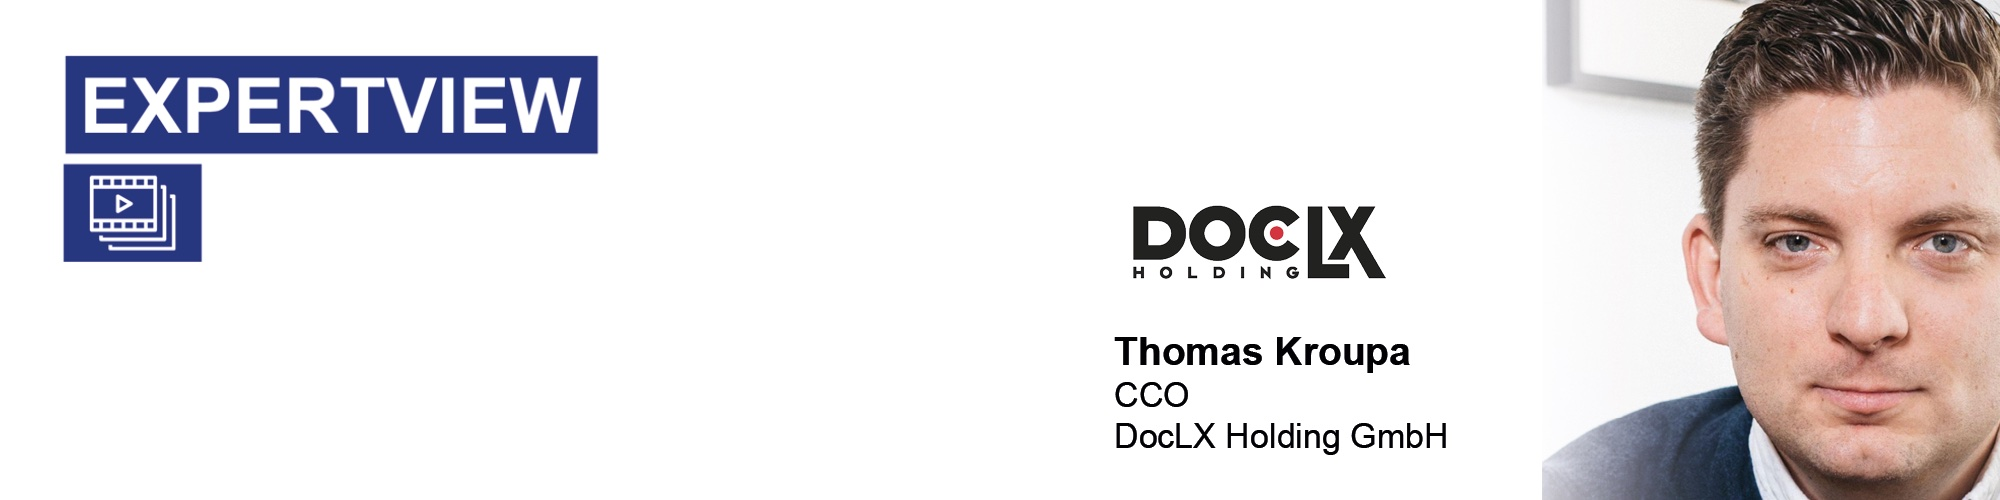 header_doclx